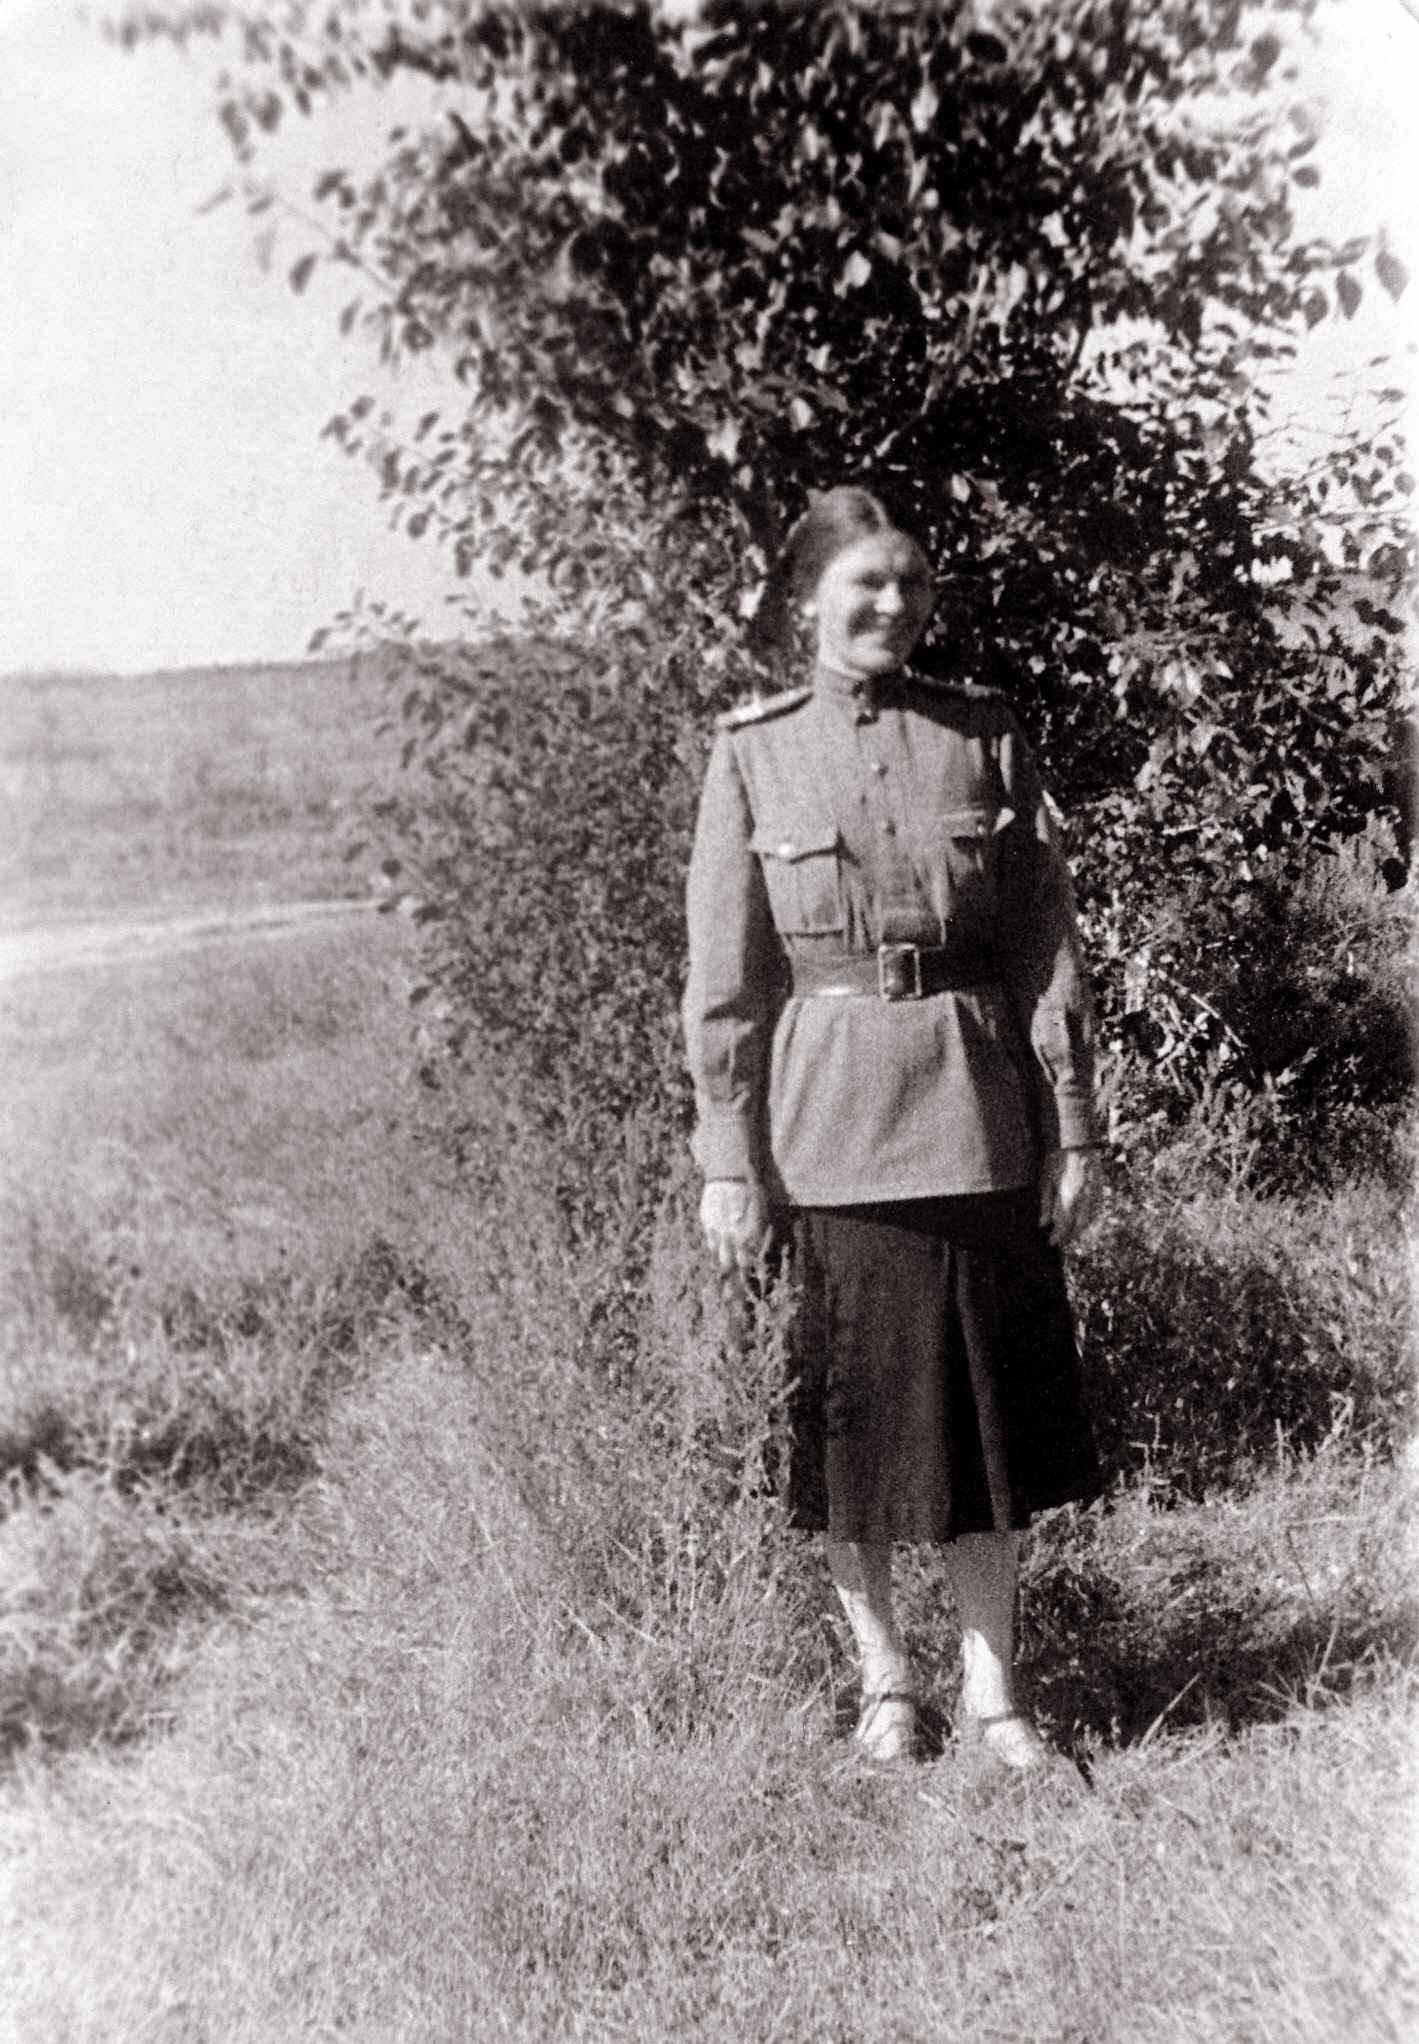 Экспонат #44. Анна Федоровна Микоша. Долинка (ныне Казахстан)